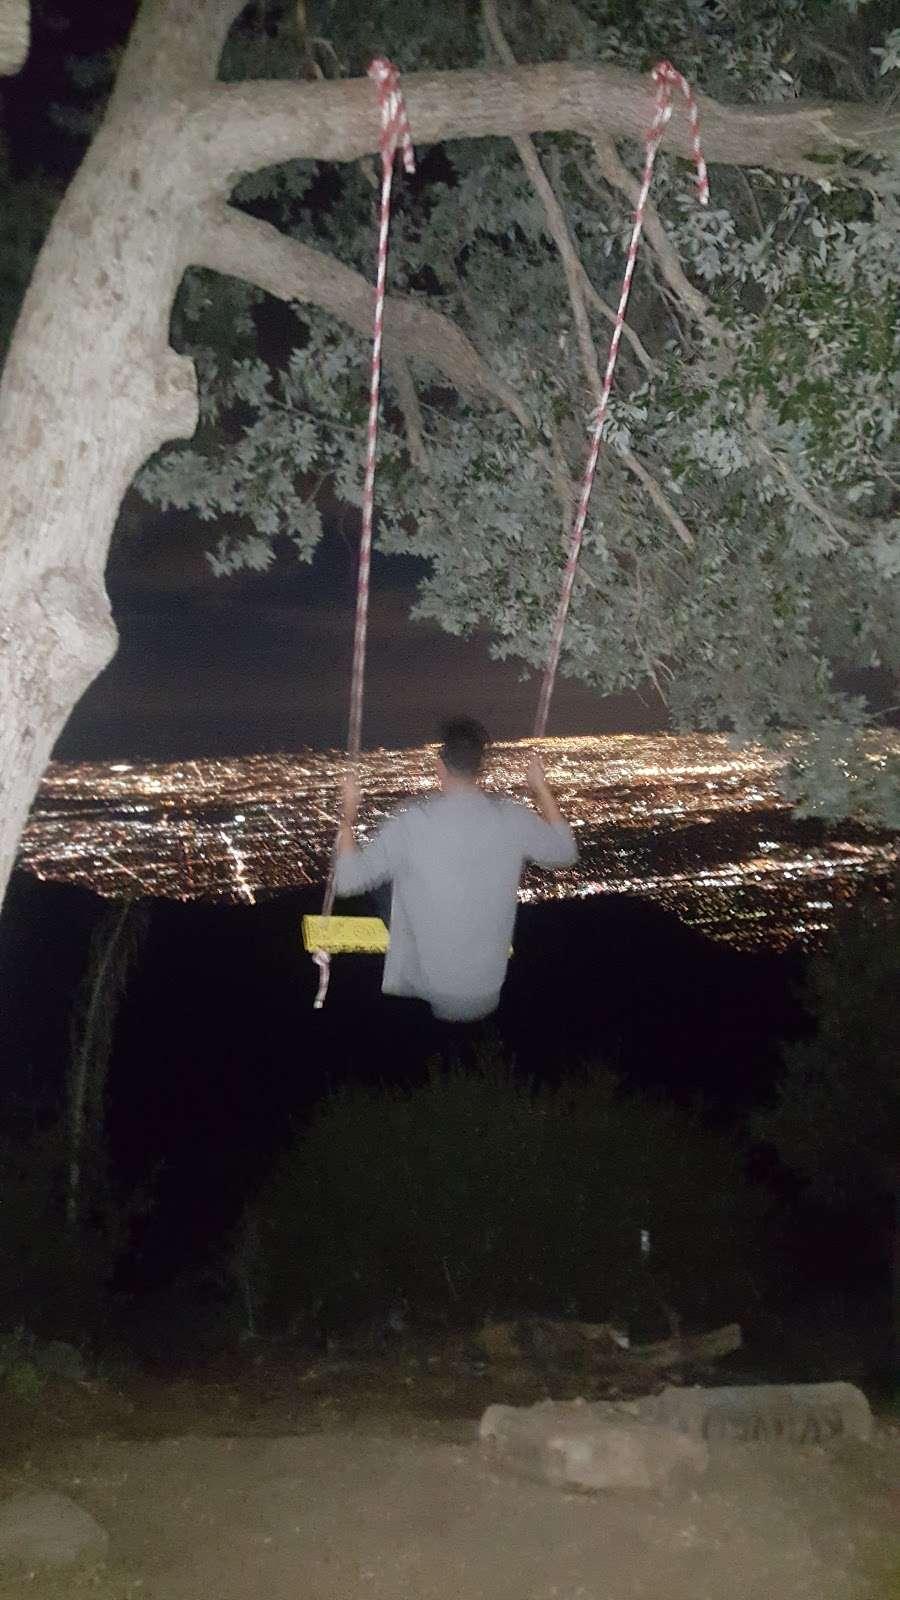 Secret Swings Mount Wilson - park  | Photo 4 of 10 | Address: Mt Wilson Circle Road, Pasadena, CA 91107, USA